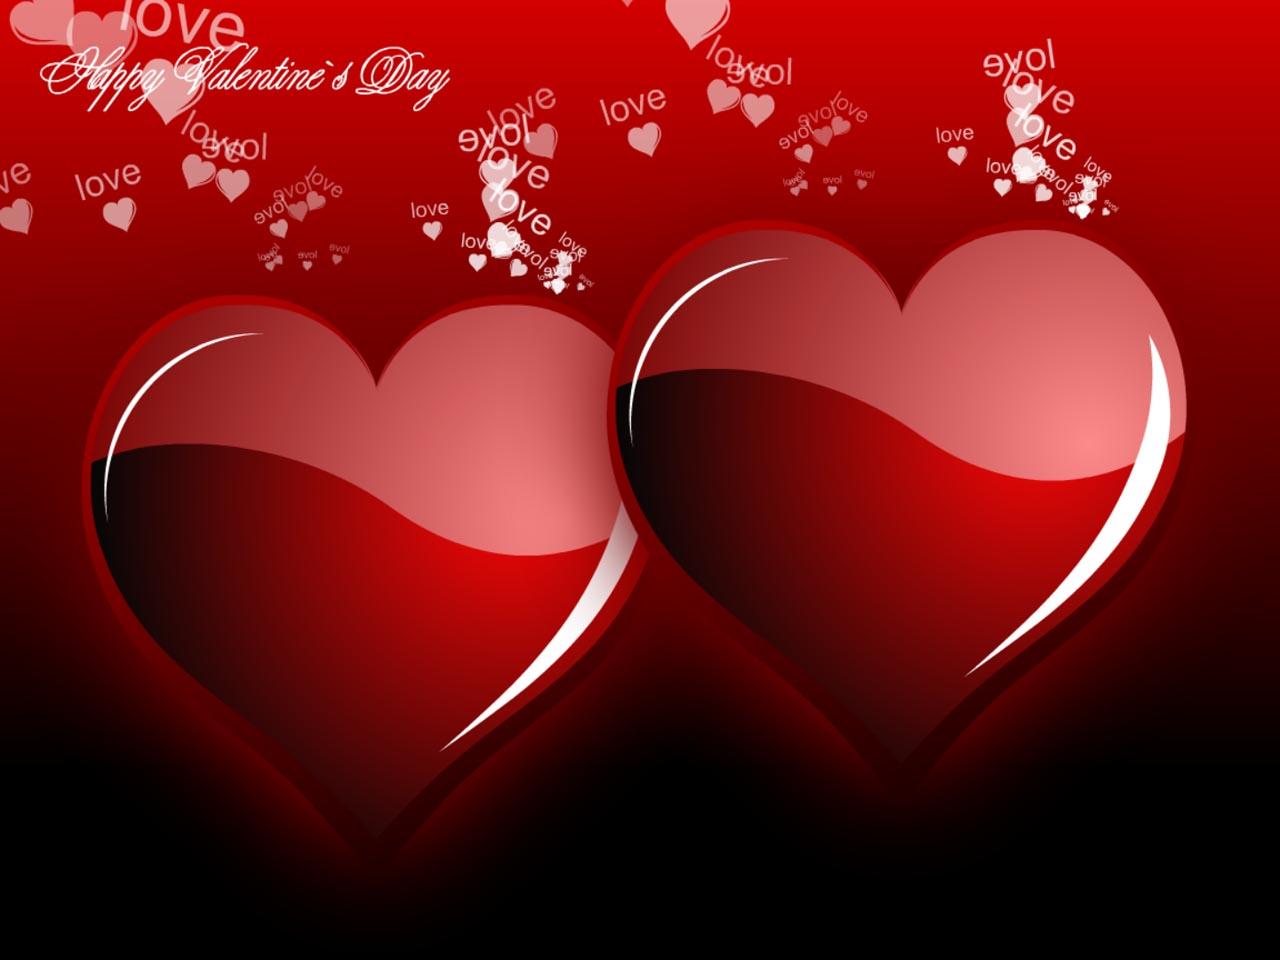 Valentine Screensavers Wallpaper Love Screensaver 146834 Hd